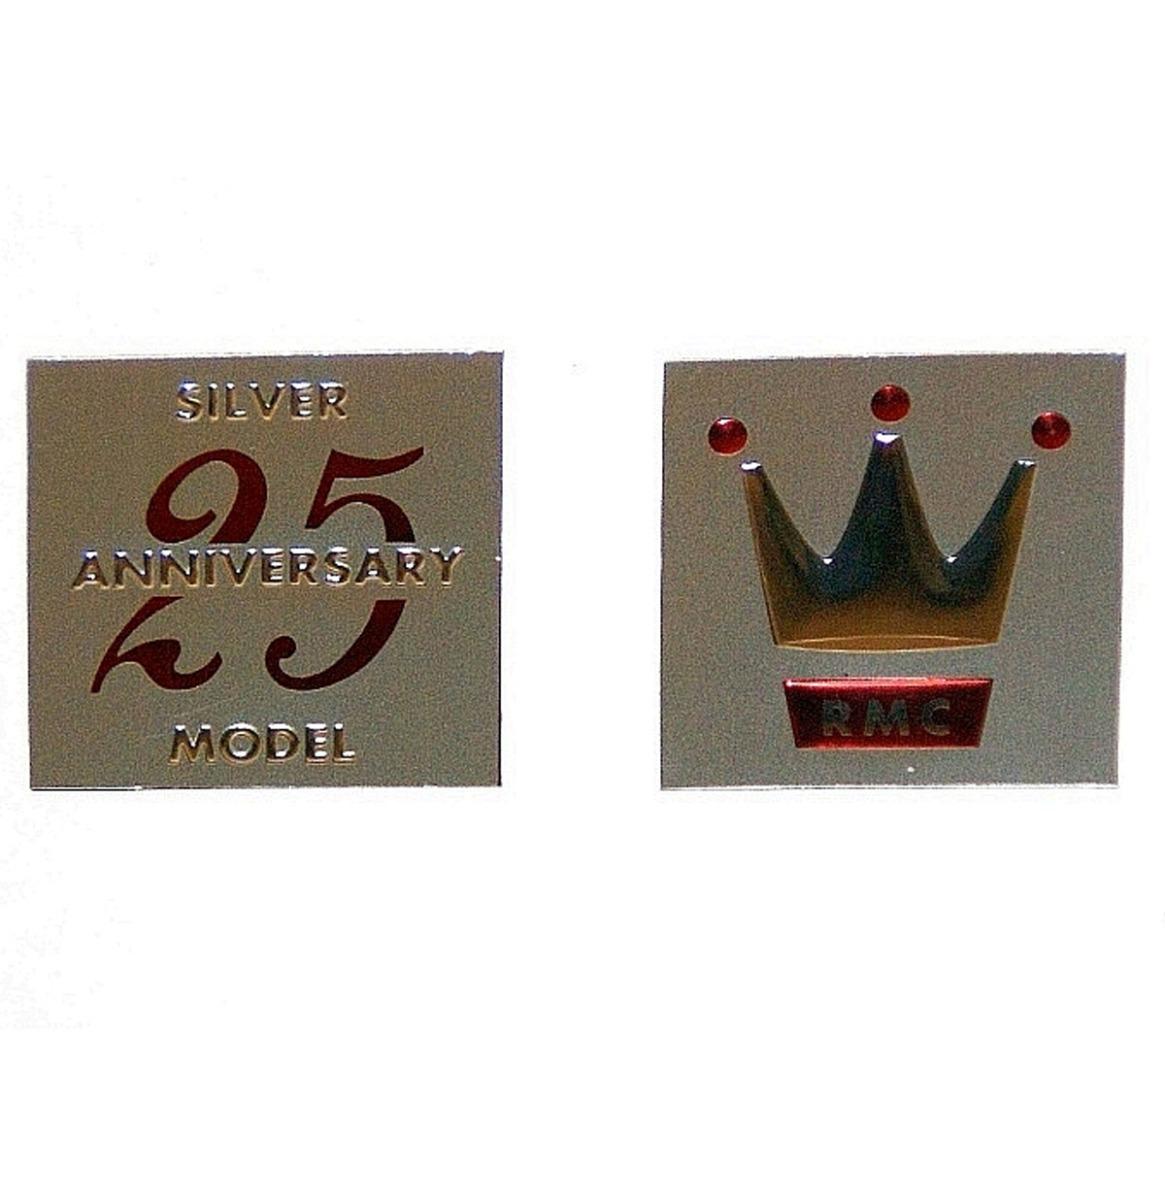 Rock-Ola Tempo 2 Jukebox Afdekkap Mechaniek Ornament Stickers